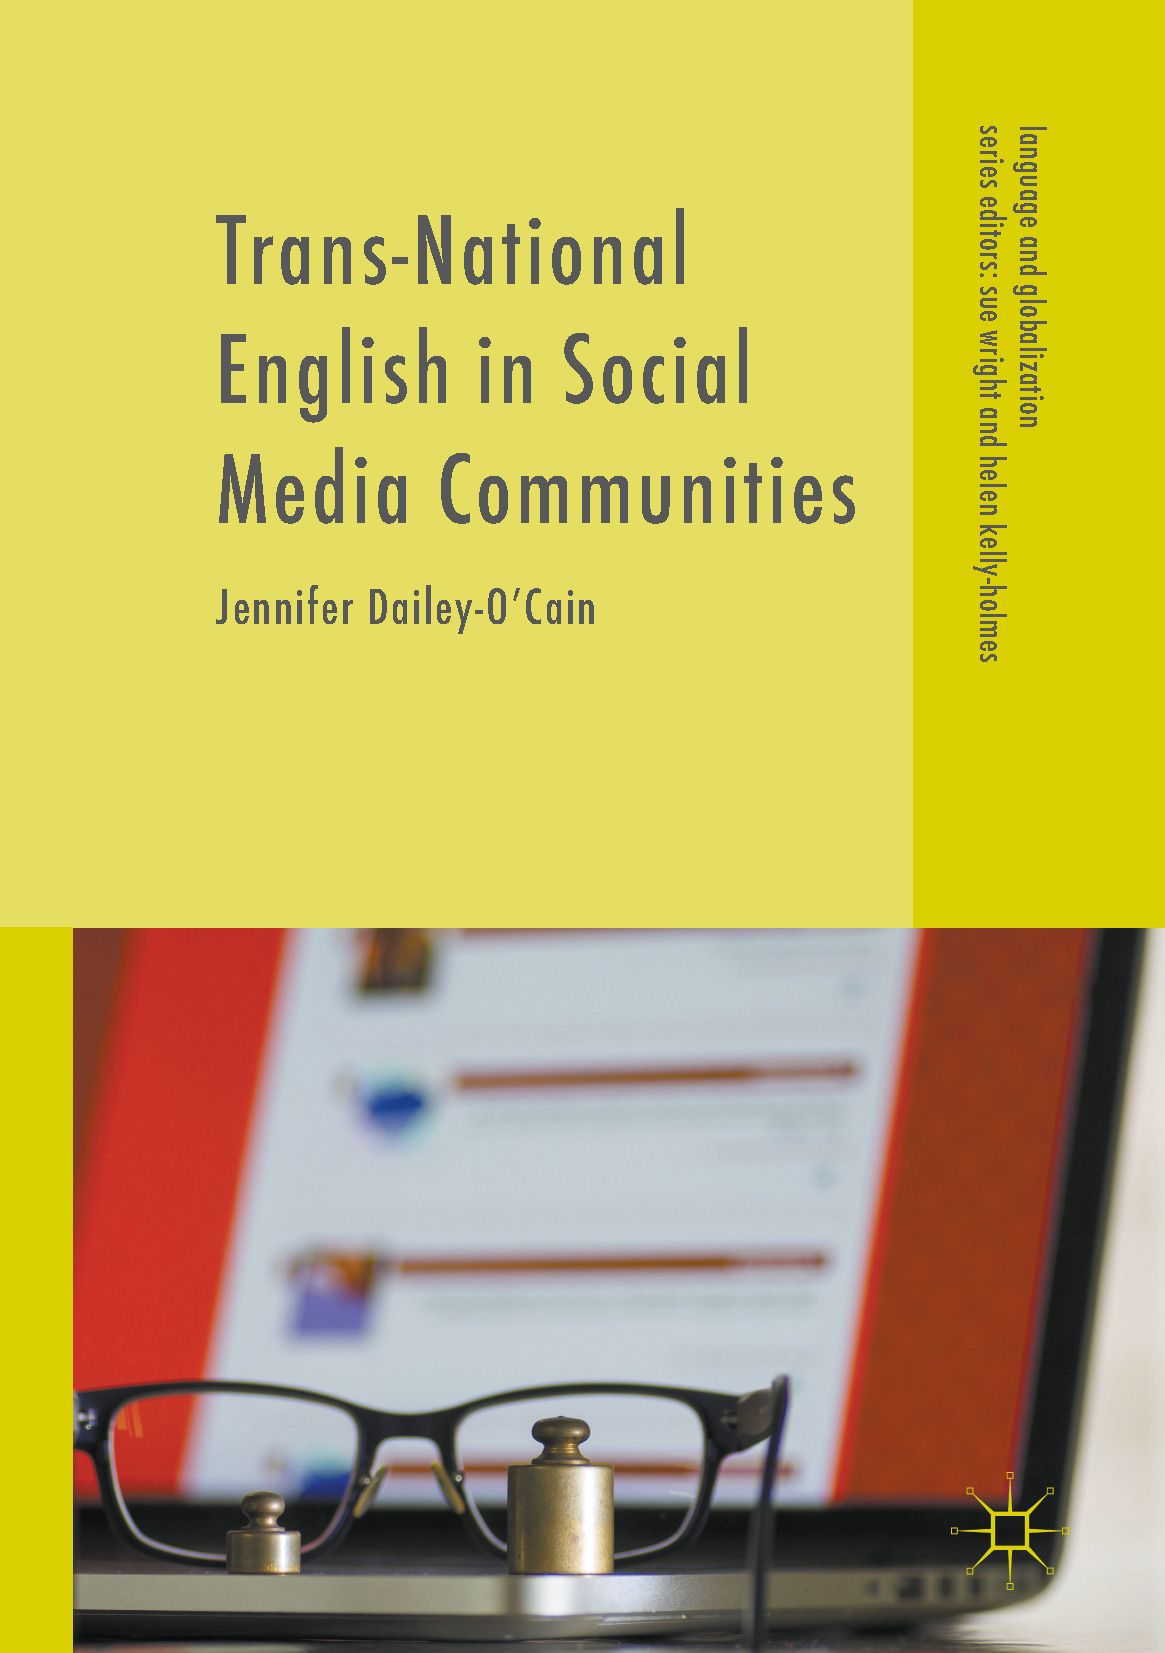 Dailey-O'Cain, Jennifer - Trans-National English in Social Media Communities, ebook